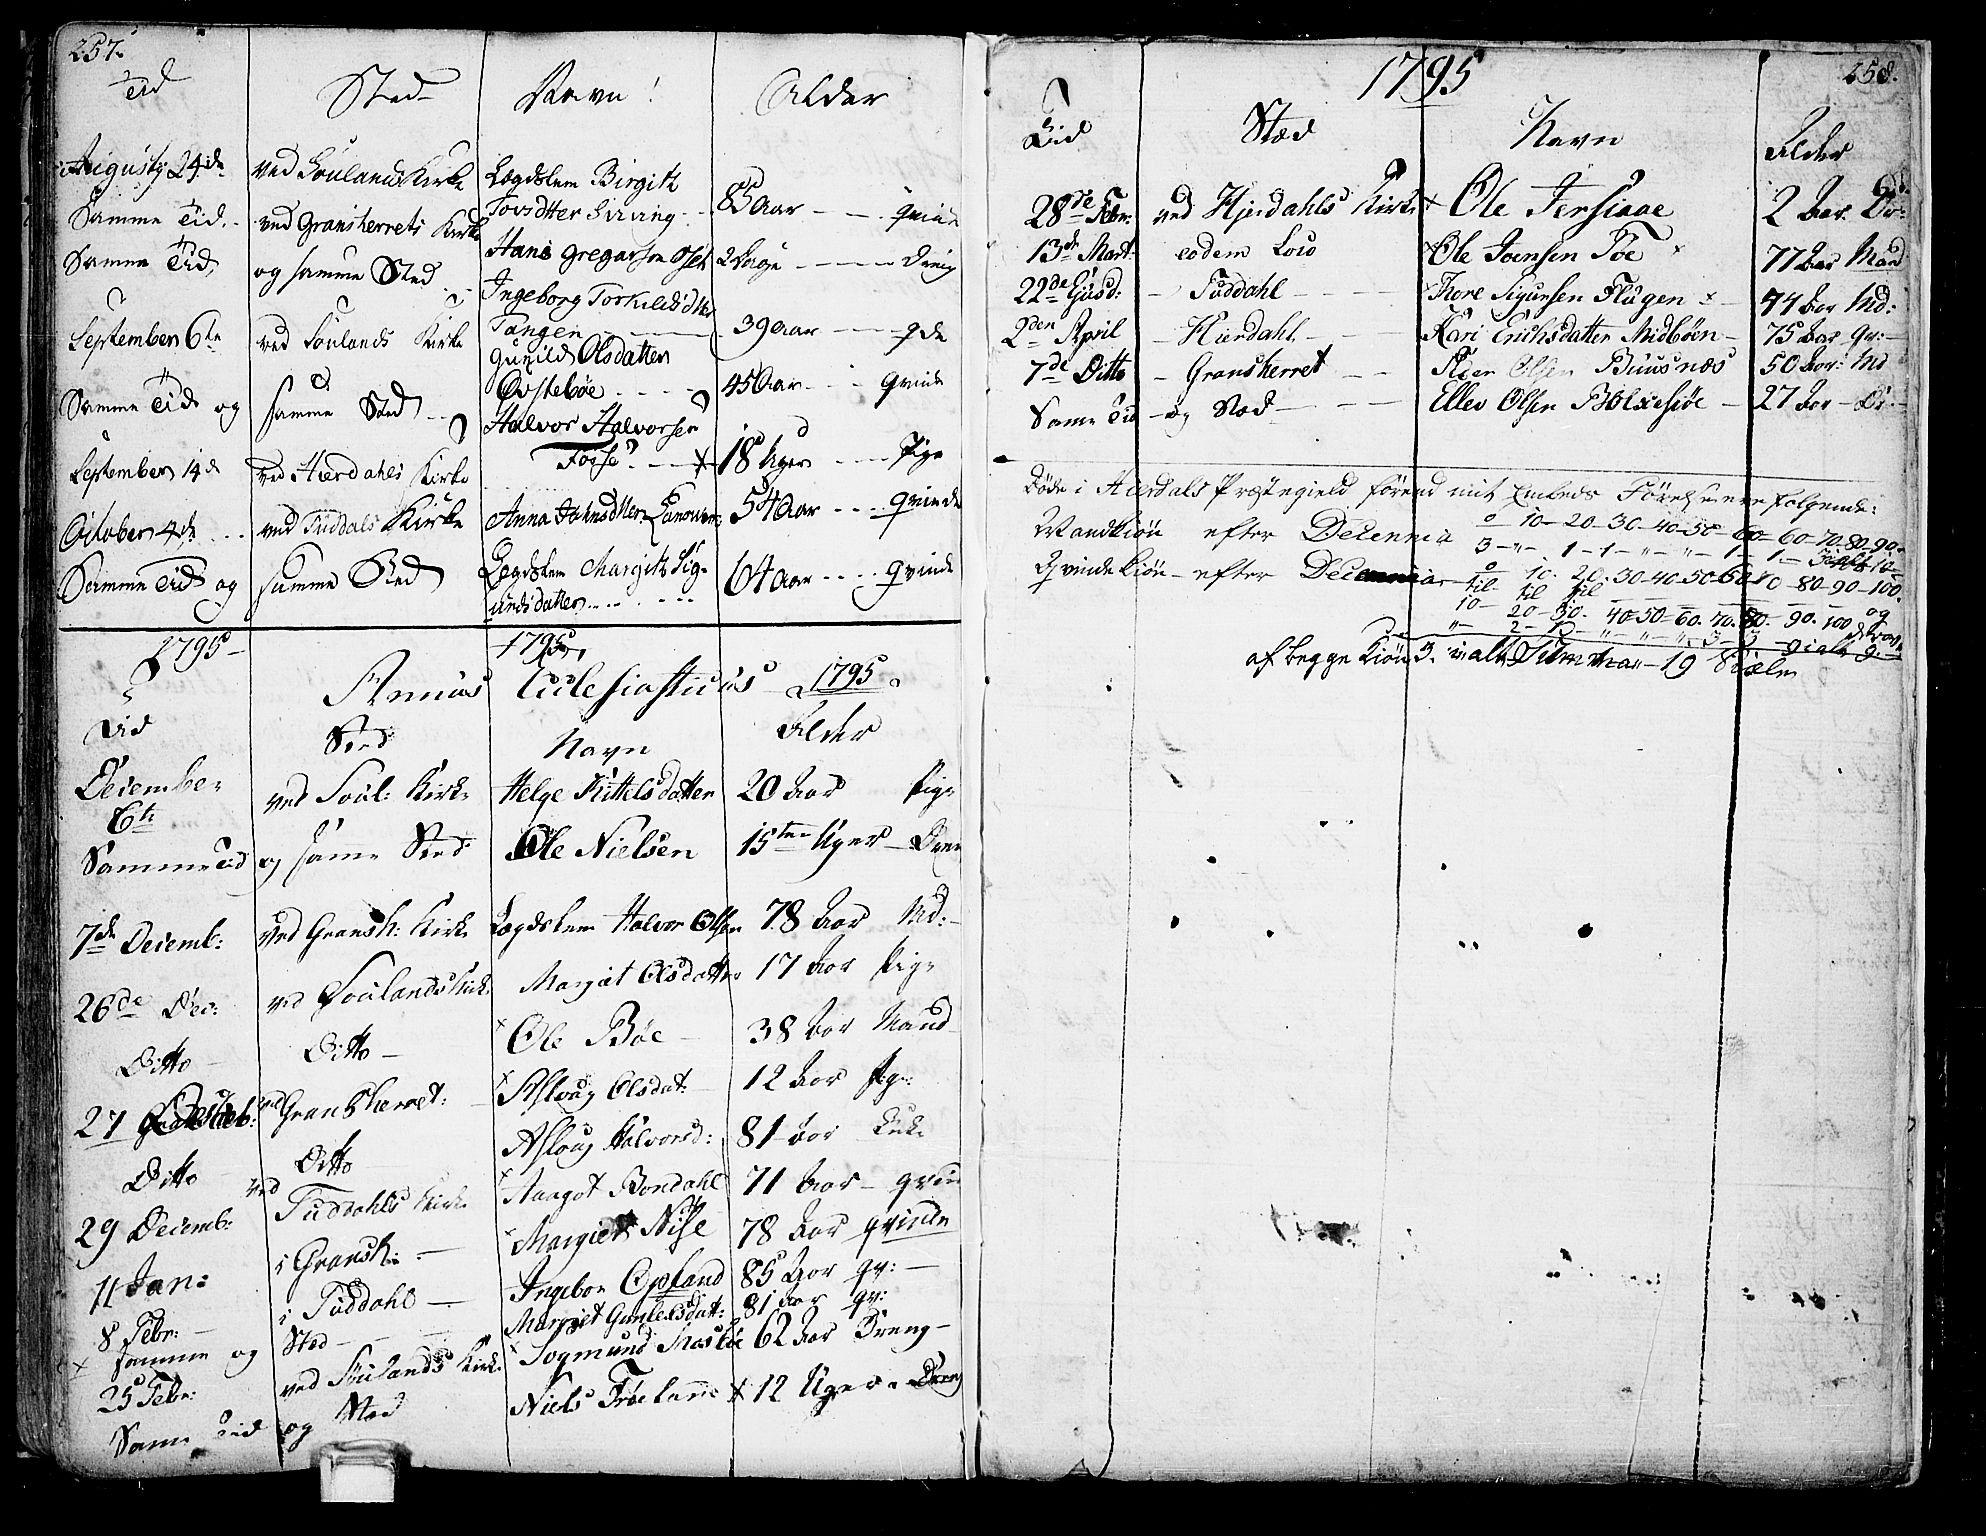 SAKO, Hjartdal kirkebøker, F/Fa/L0005: Ministerialbok nr. I 5, 1776-1801, s. 257-258